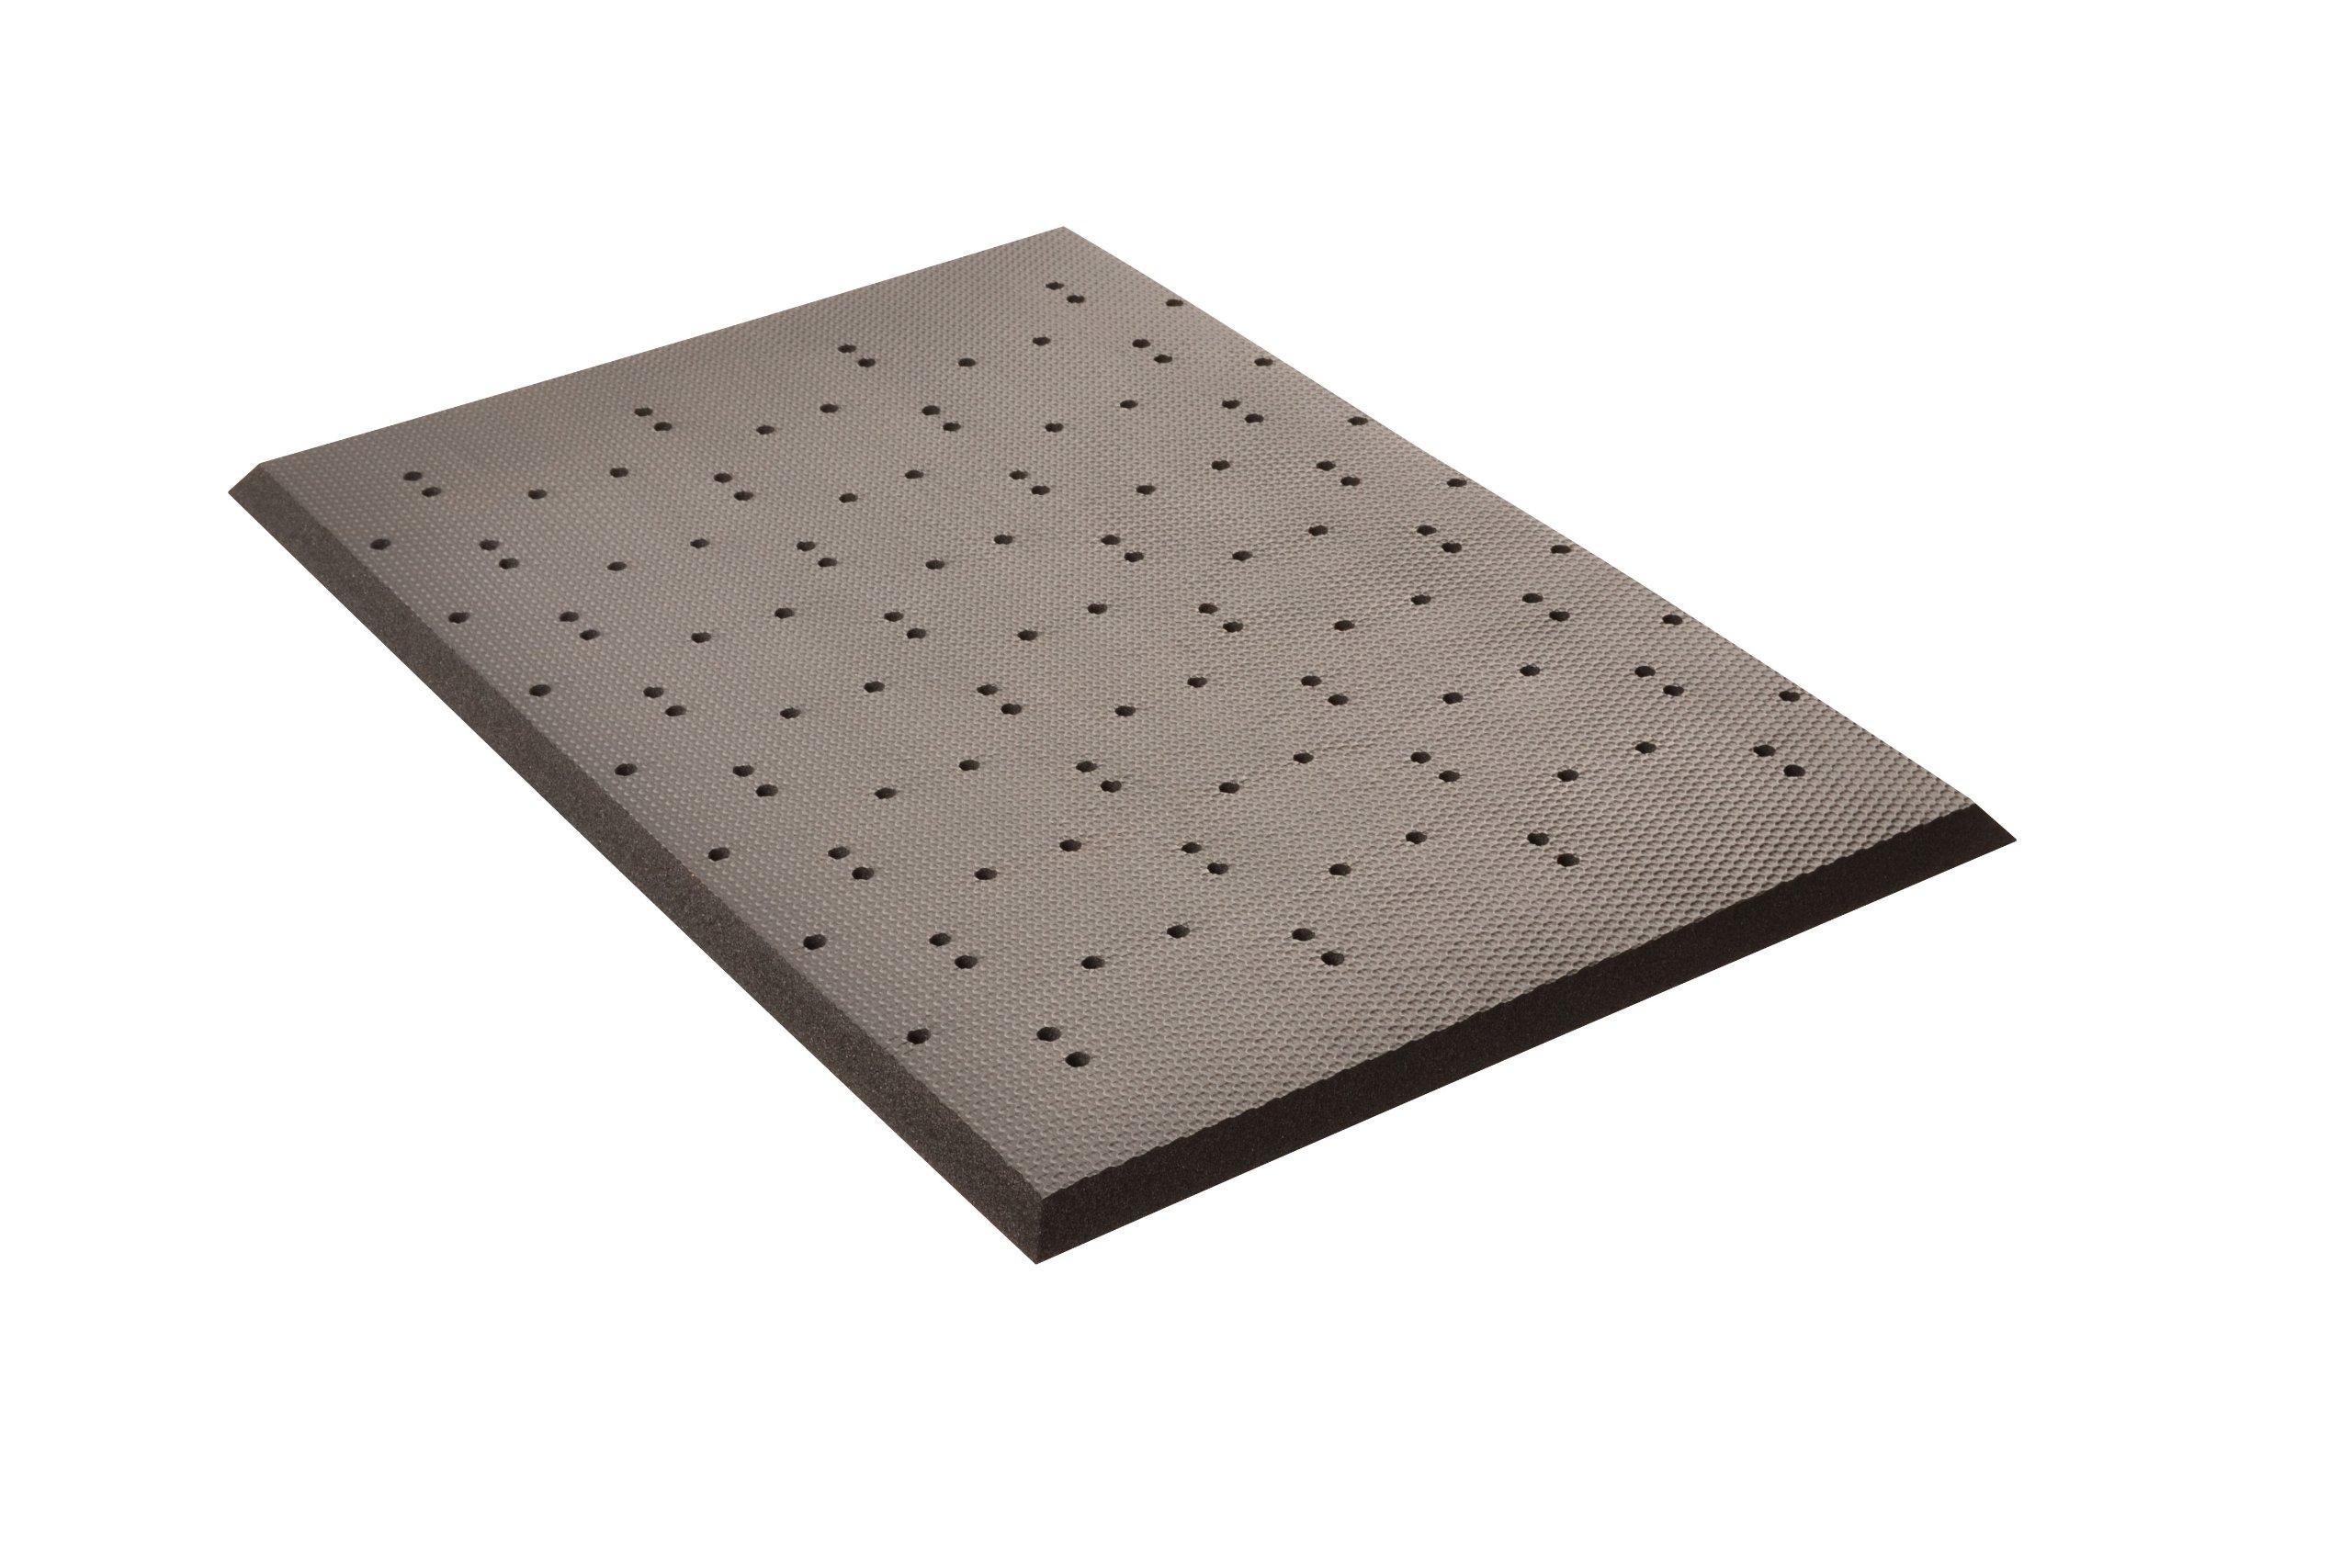 NoTrax 441S0035BL Superfoam Plus Perforated Floor Mat, 3' x 5', Black